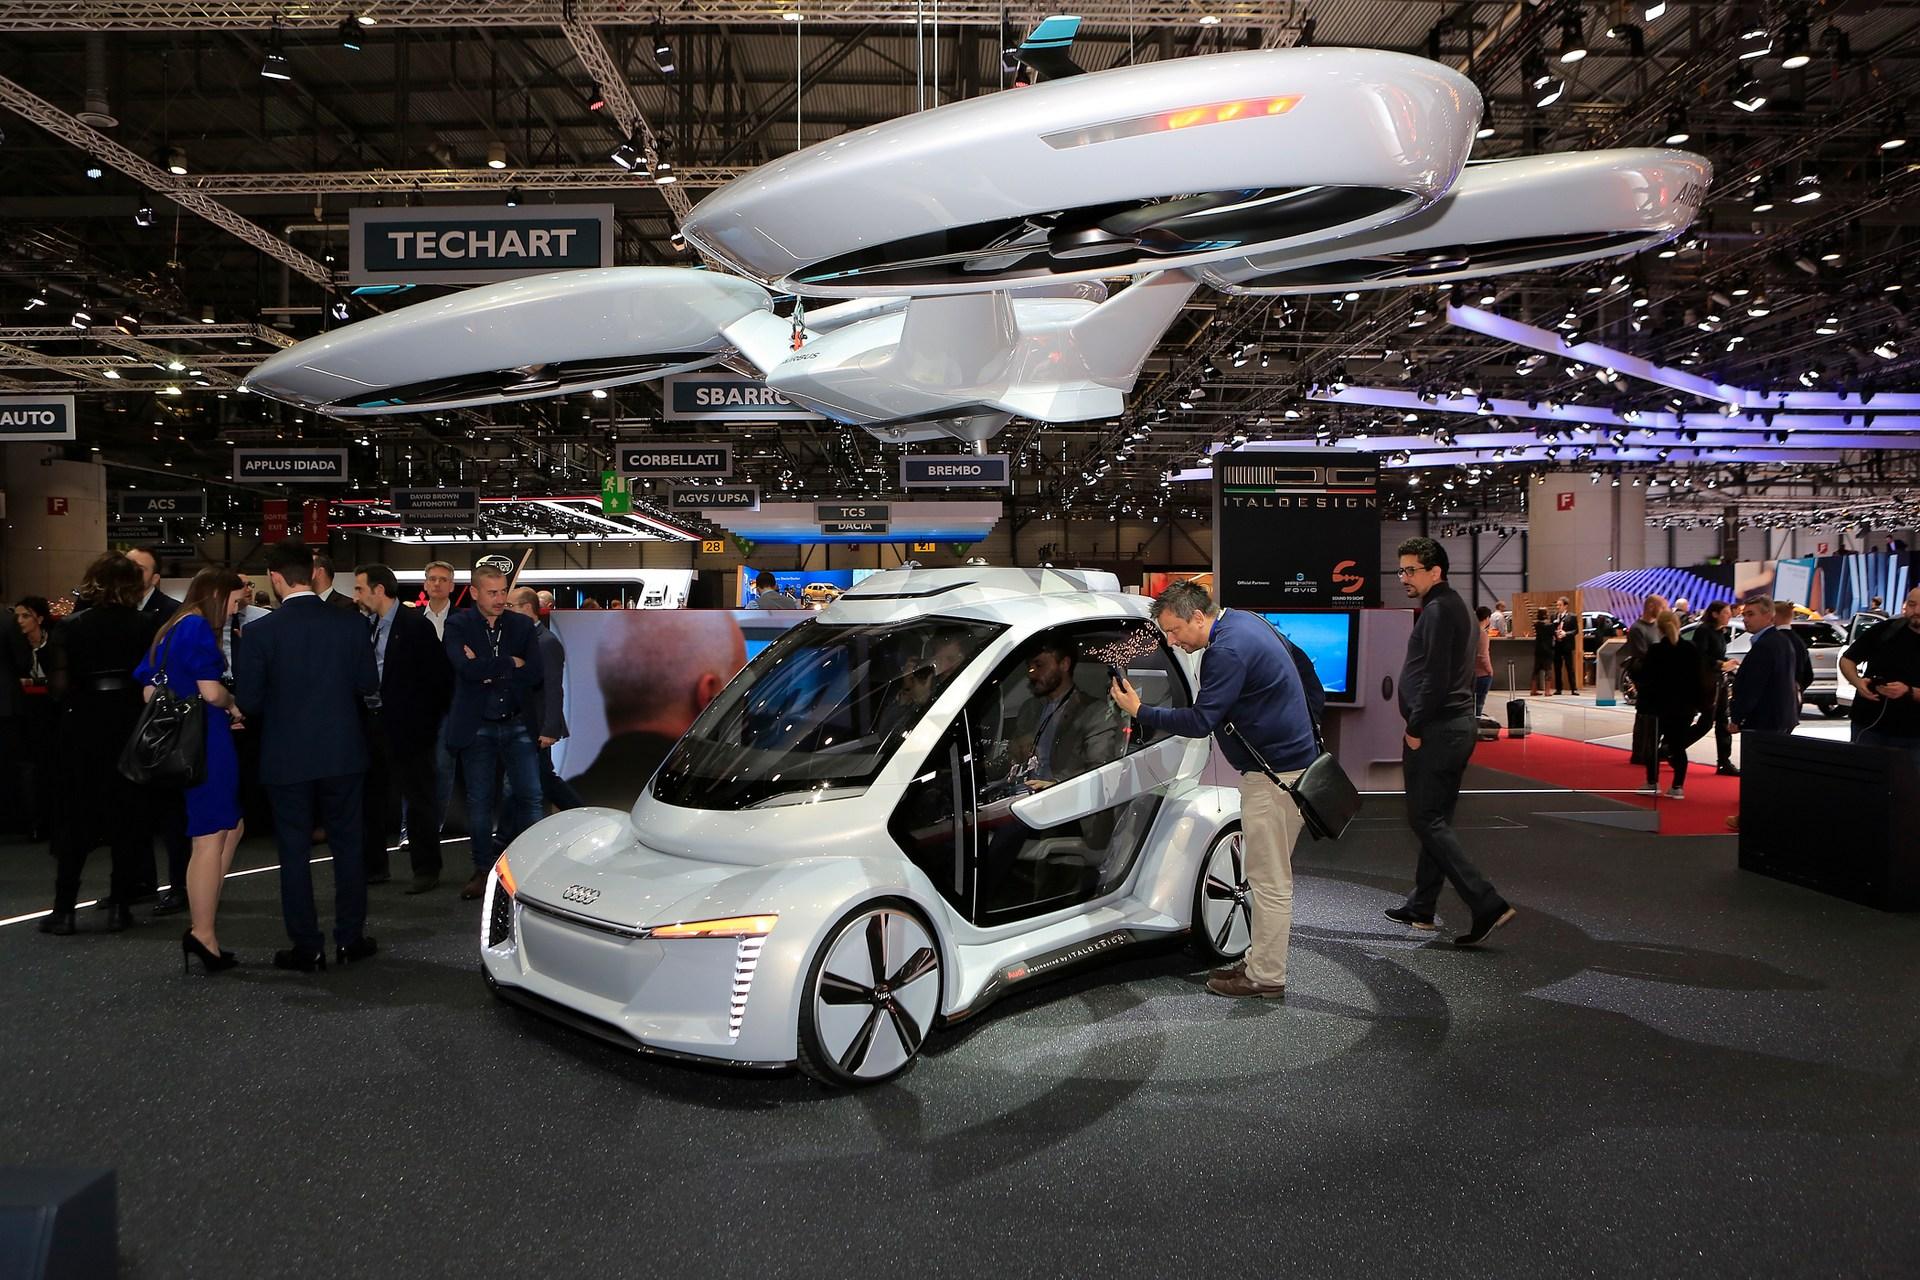 Pop.Up Next: Αυτόνομο ιπτάμενο όχημα από τις Audi, Airbus ...